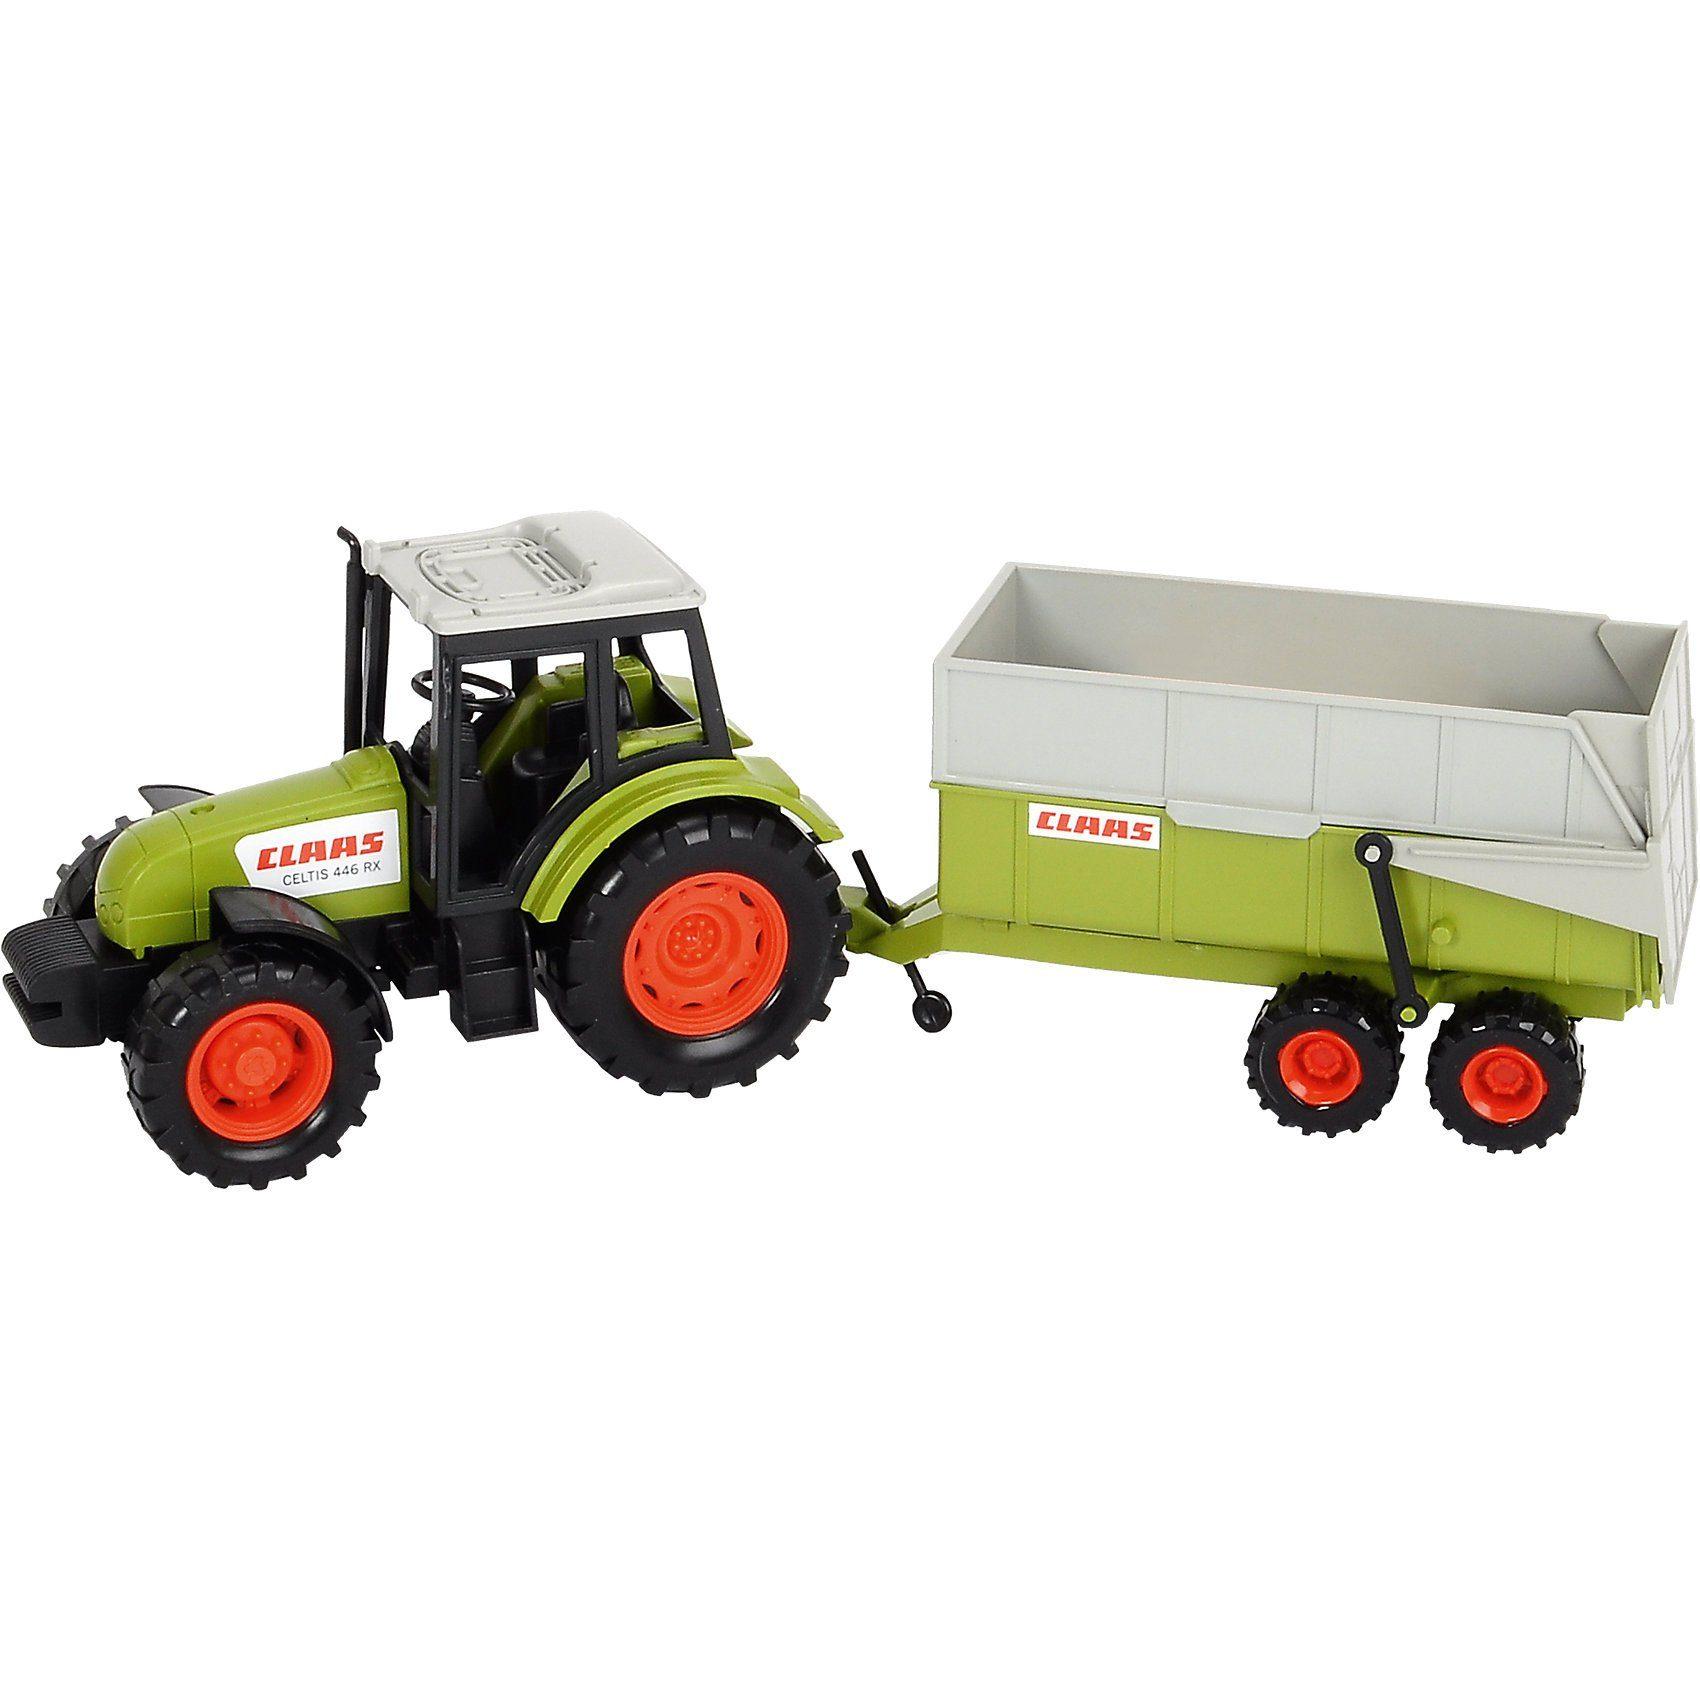 Dickie Toys Claas Traktor mit Anhänger